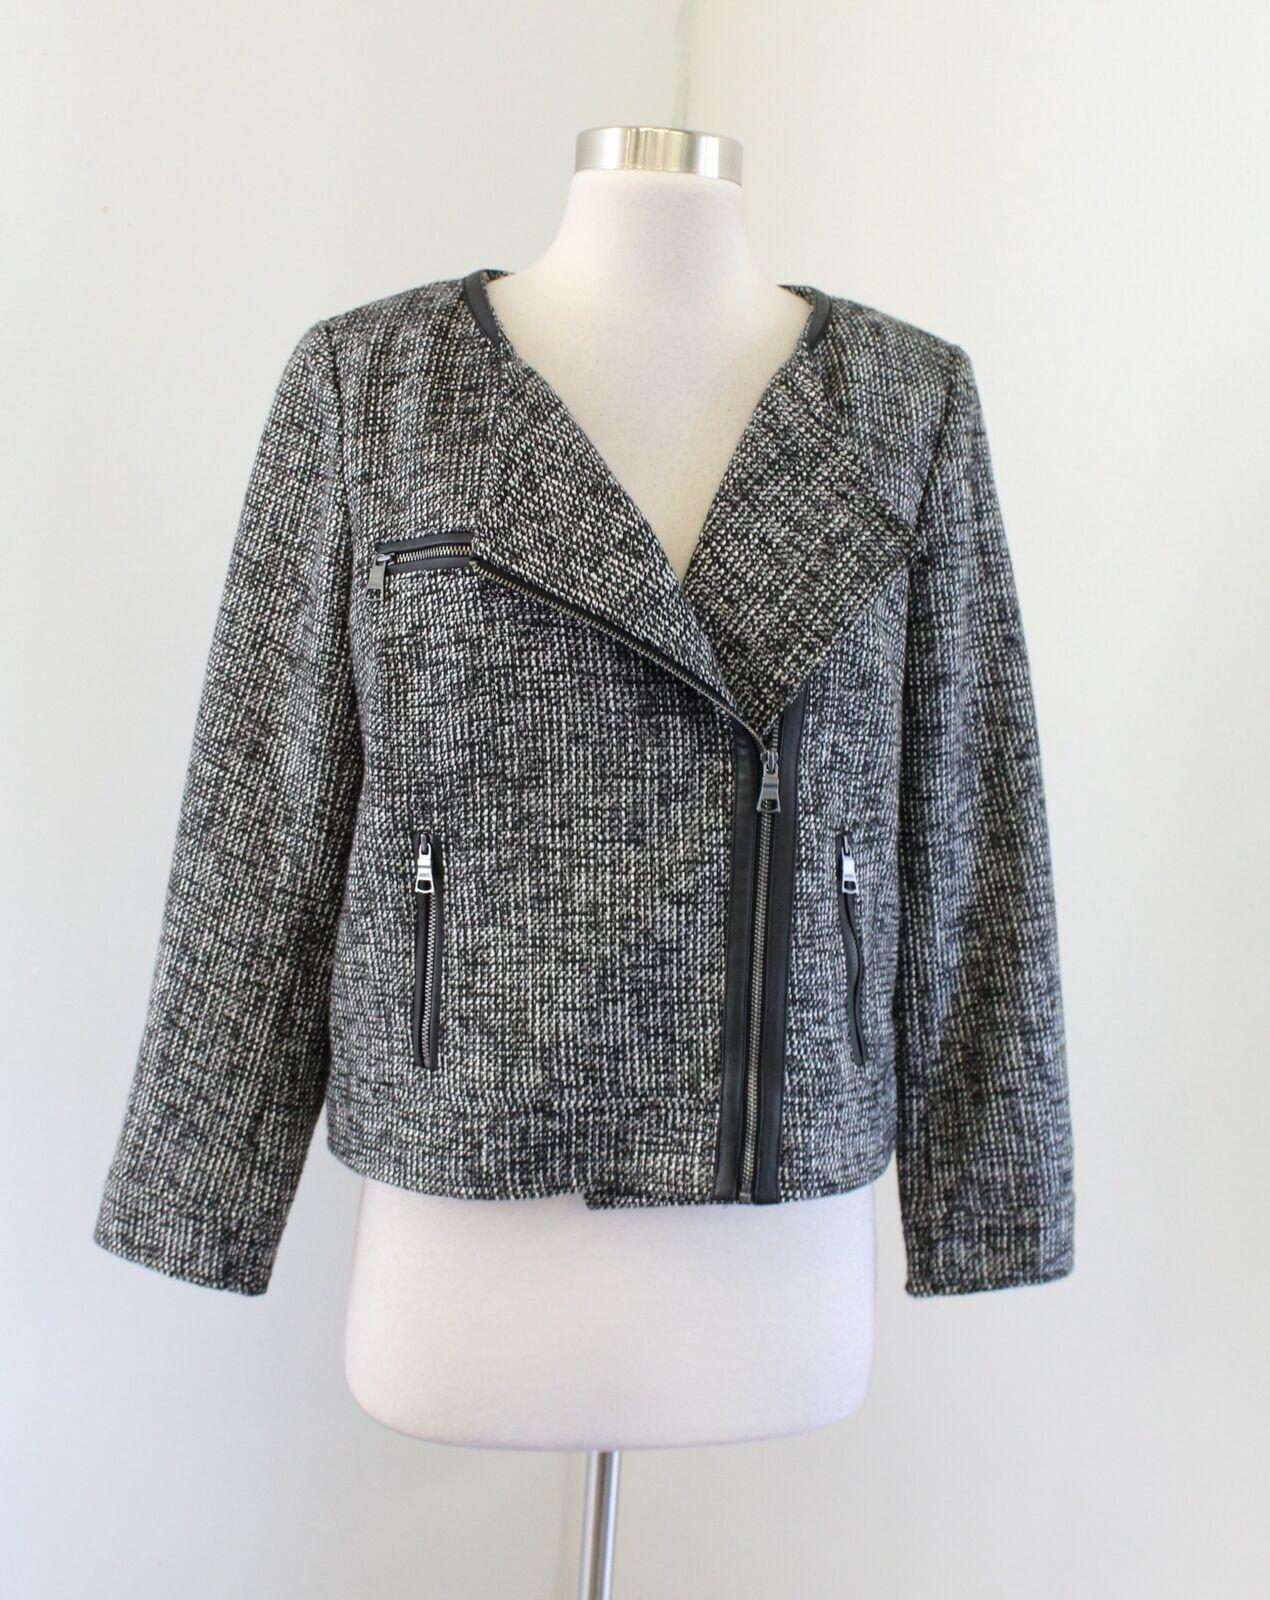 Banana Republic Tweed Asymmetrical Zip Moto Blazer Jacket Size 10 Gray Black